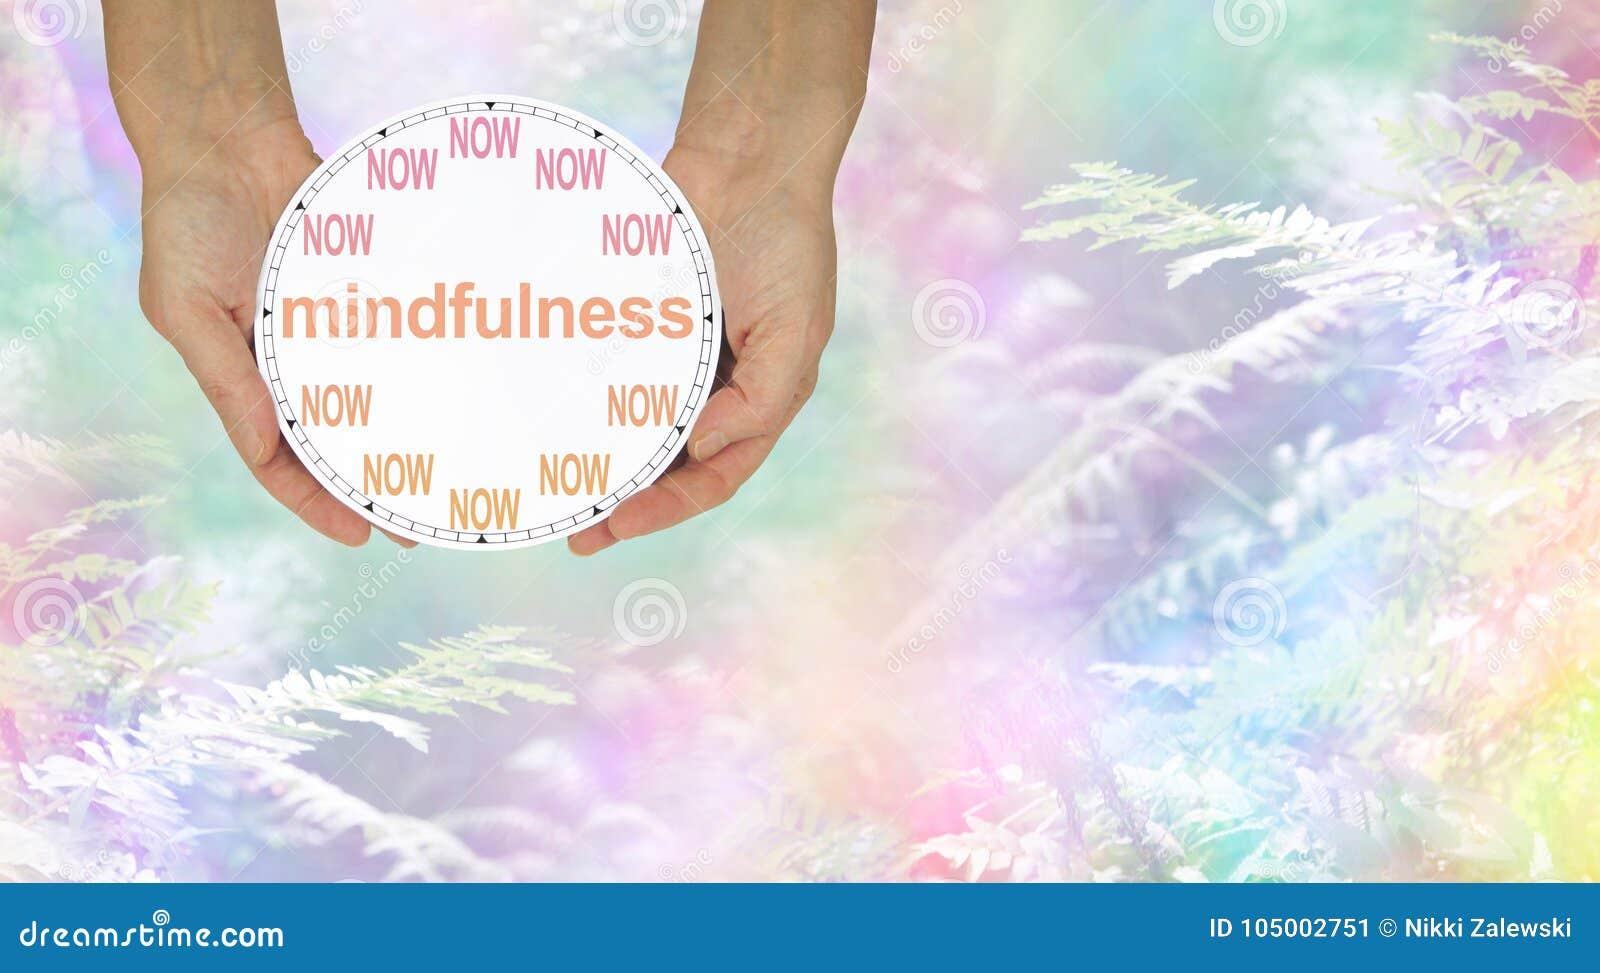 Mindfulness - robi mu TERAZ